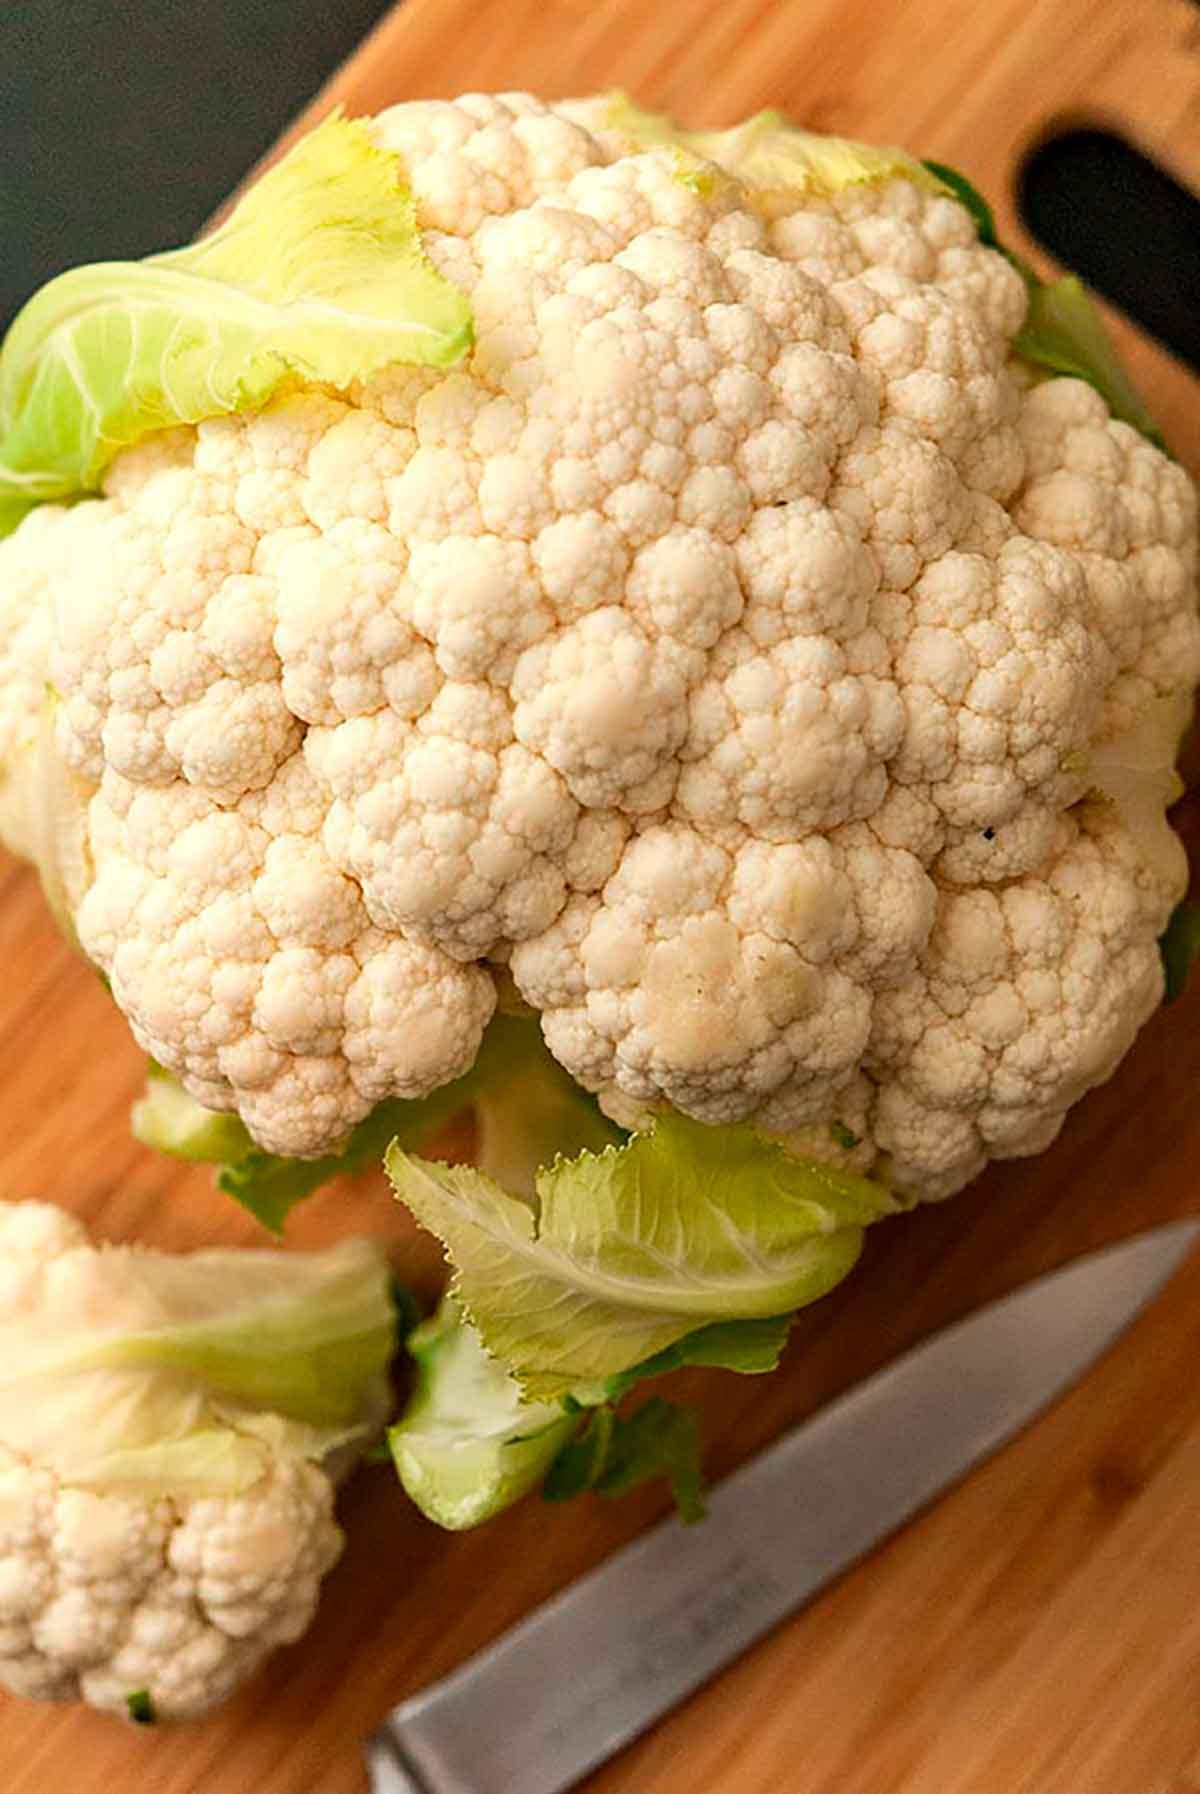 A close shot of a head of cauliflower on a cutting board beside a knife.